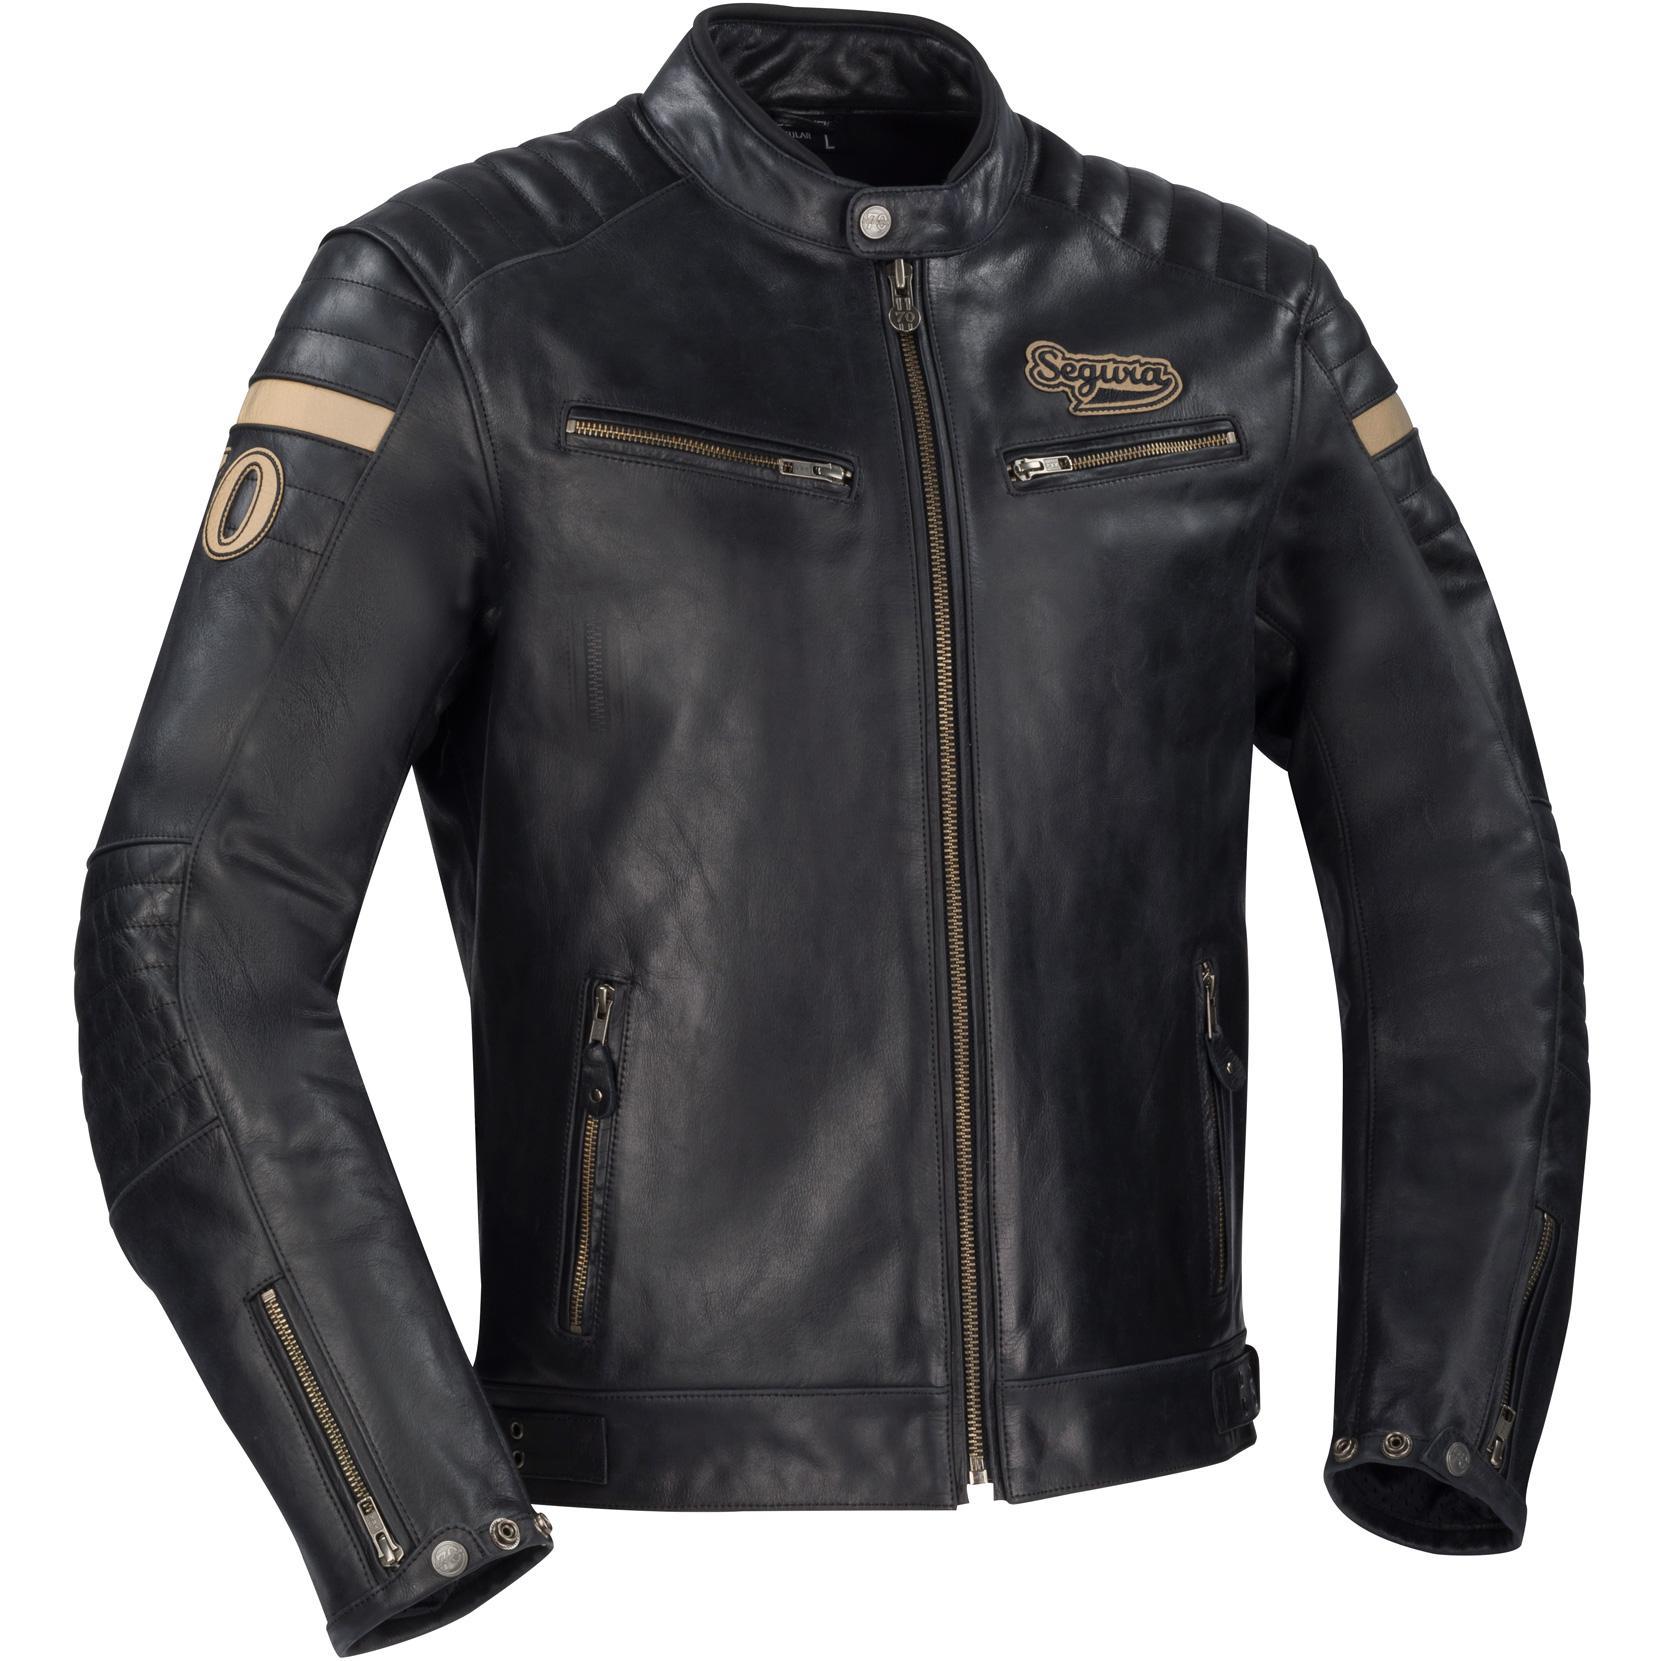 Vente veste en cuir homme